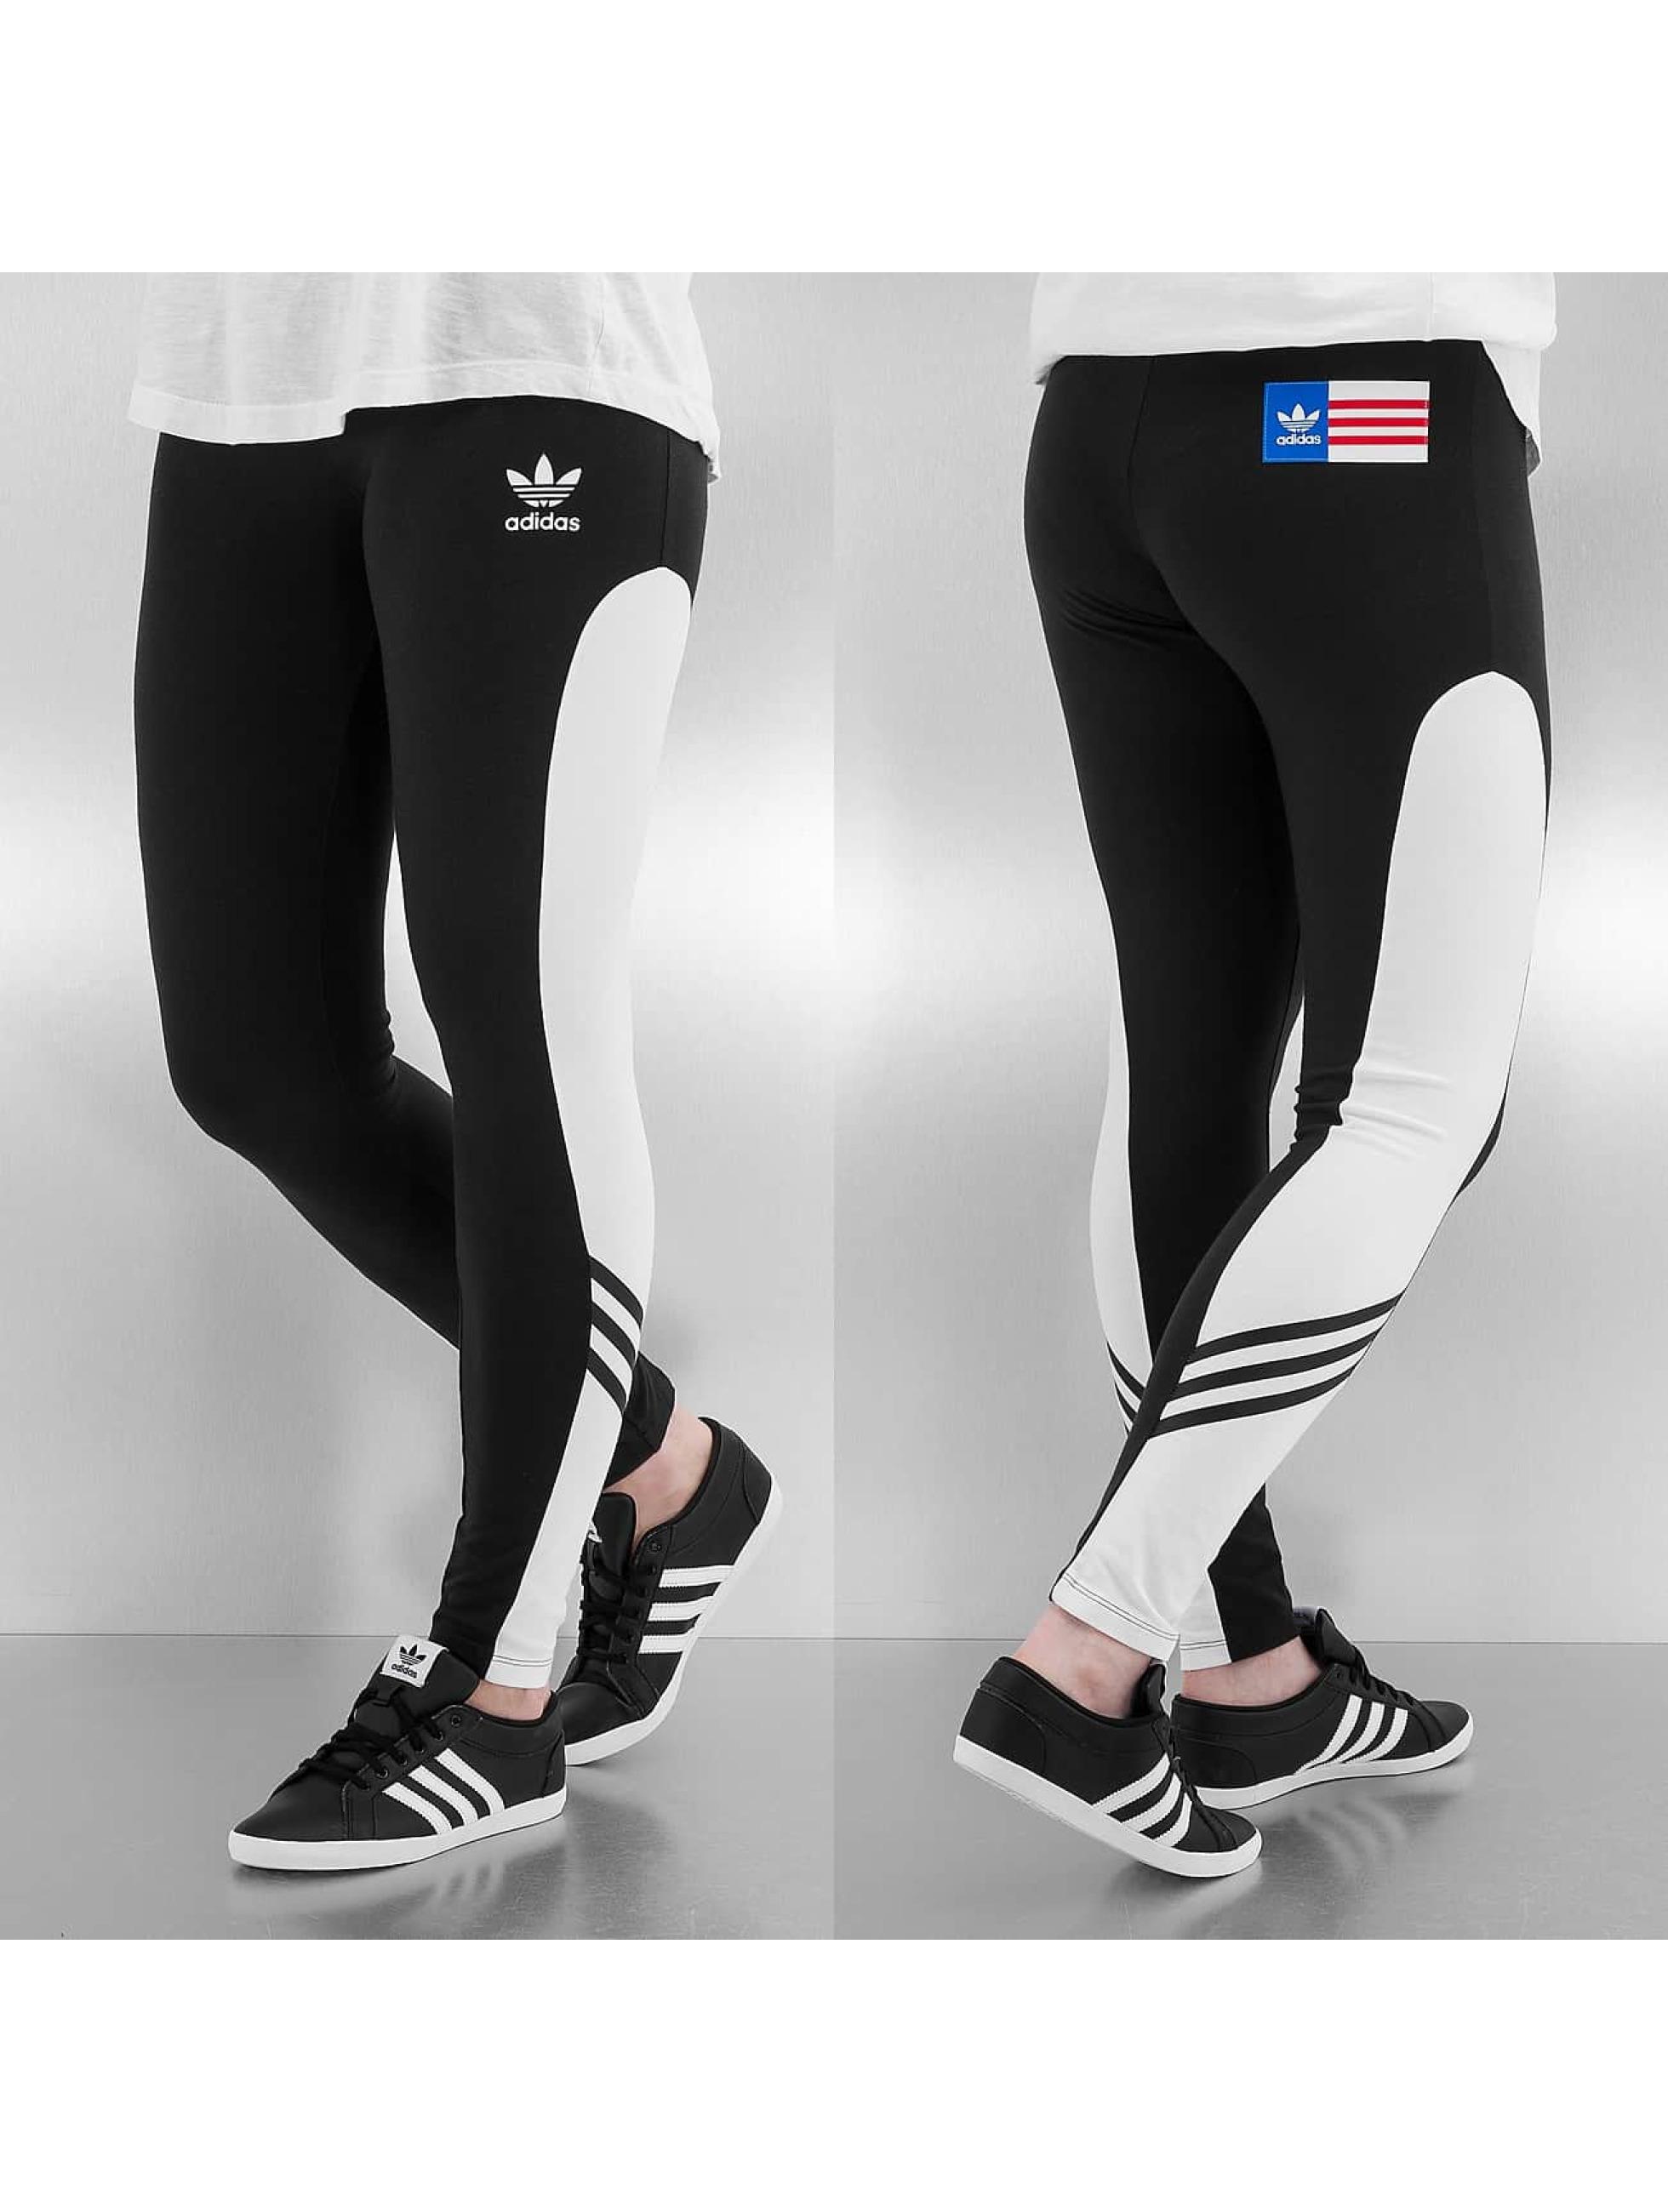 Adidas Pantalon / Leggings PP Leggings en noir 231351